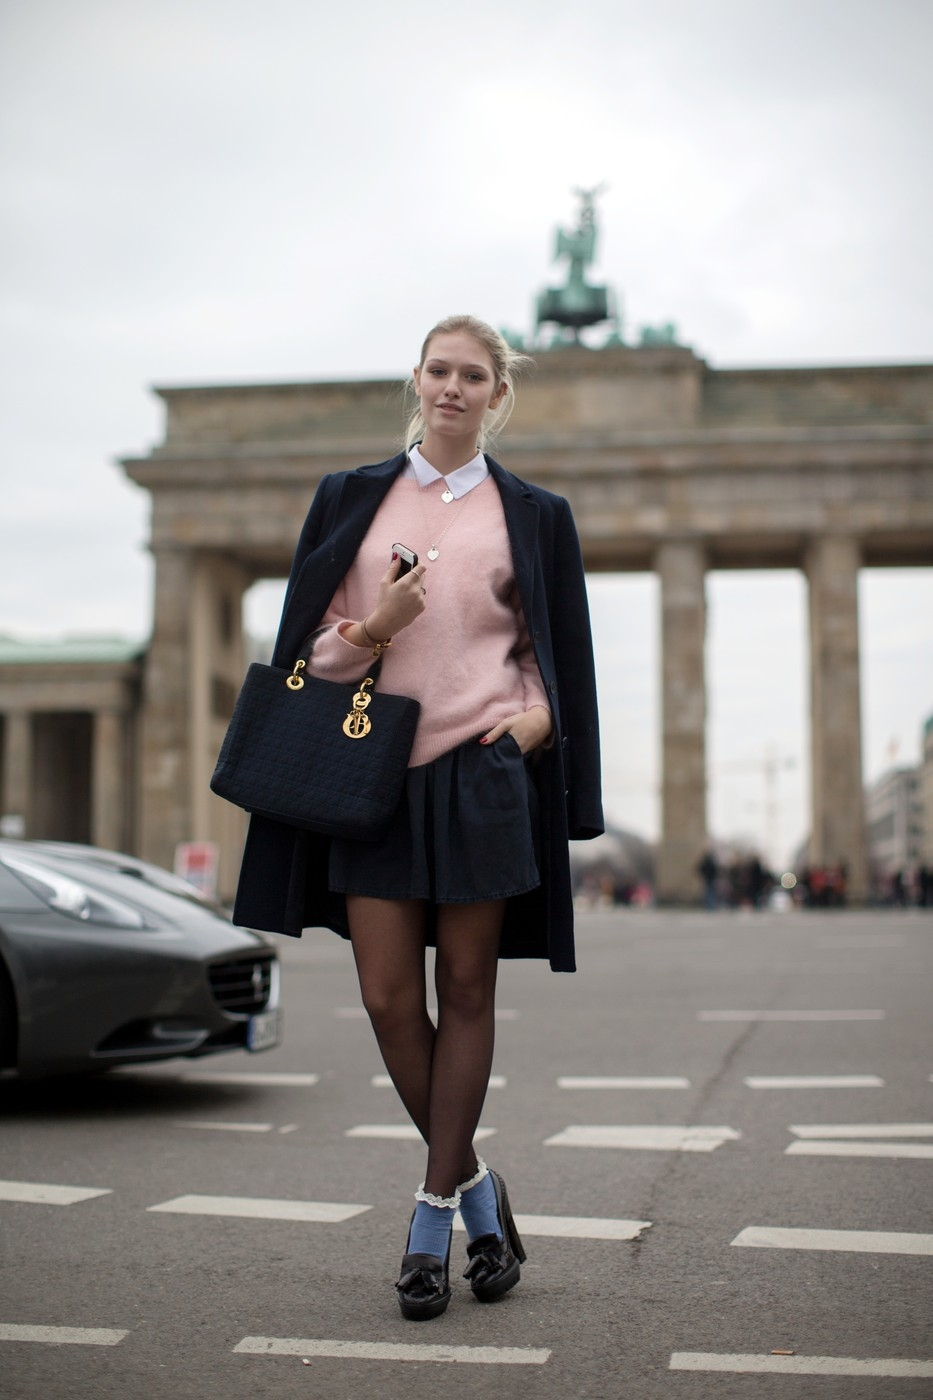 EXCLUSIVE Mercedes-Benz Fashion Week Berlin Autumn/Winter 2014 - Streetstyle